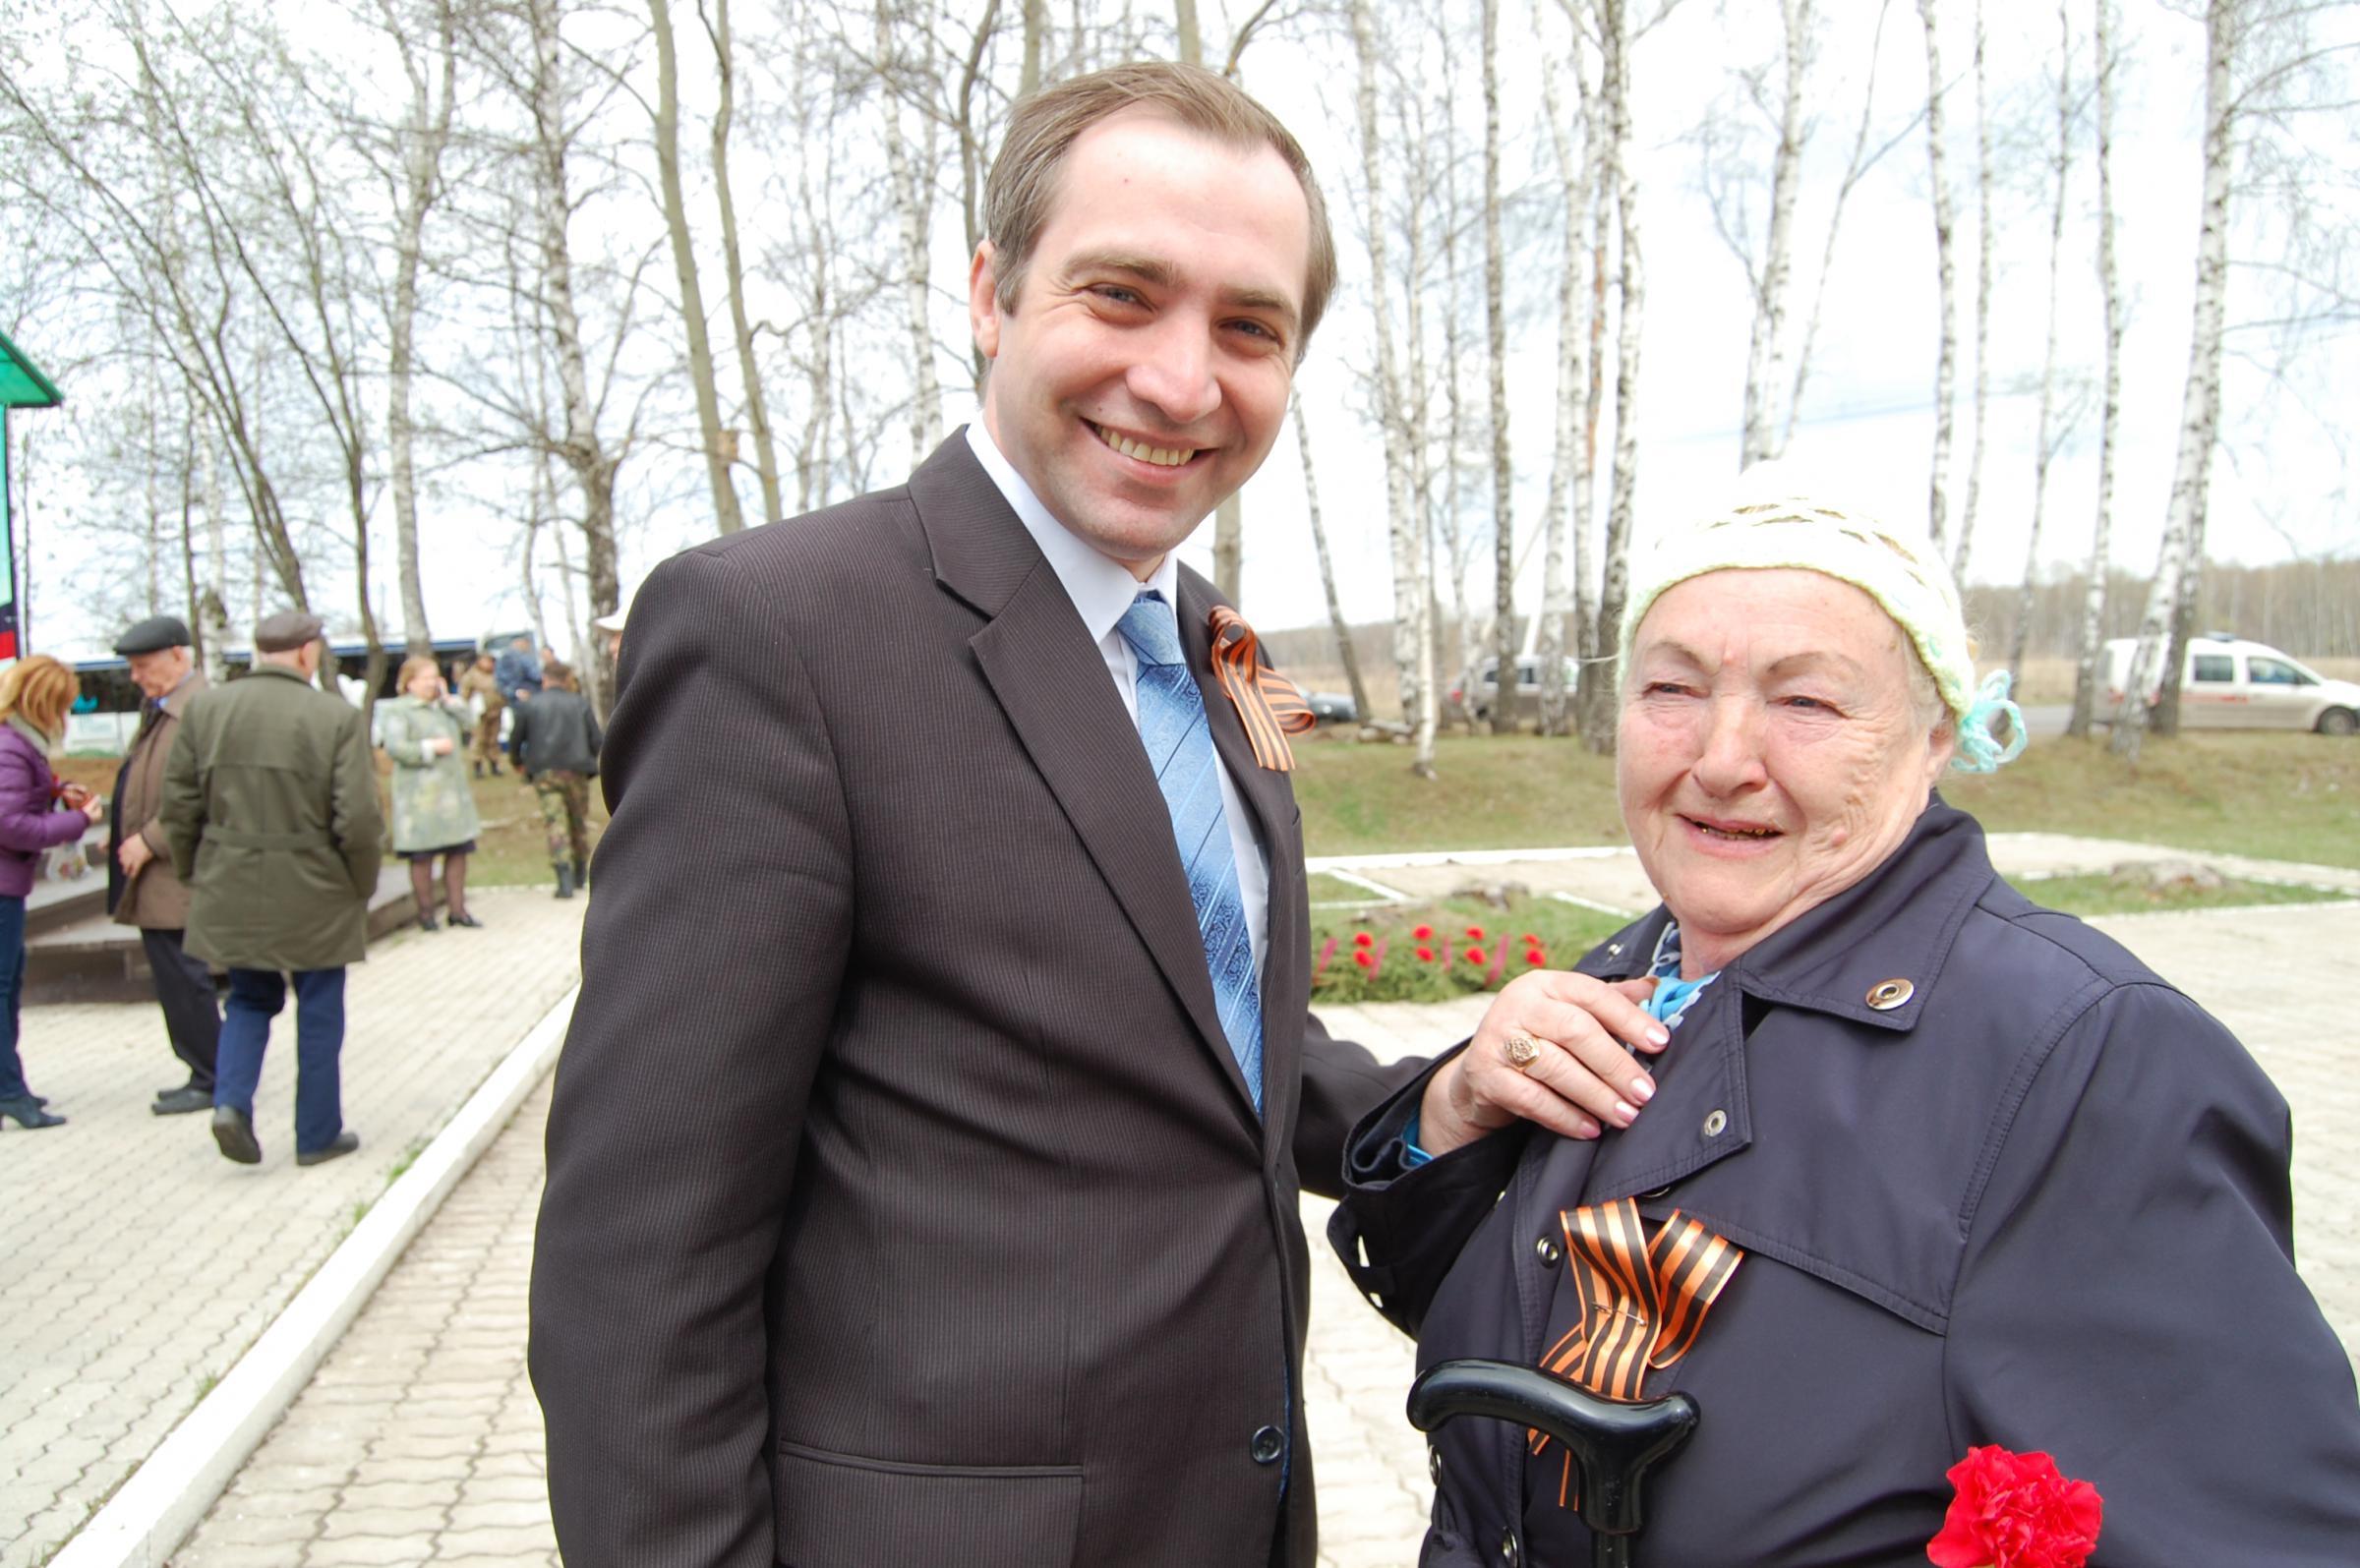 Максим Корж. Вахта  памяти в Кузовлеве. 28.04.16.